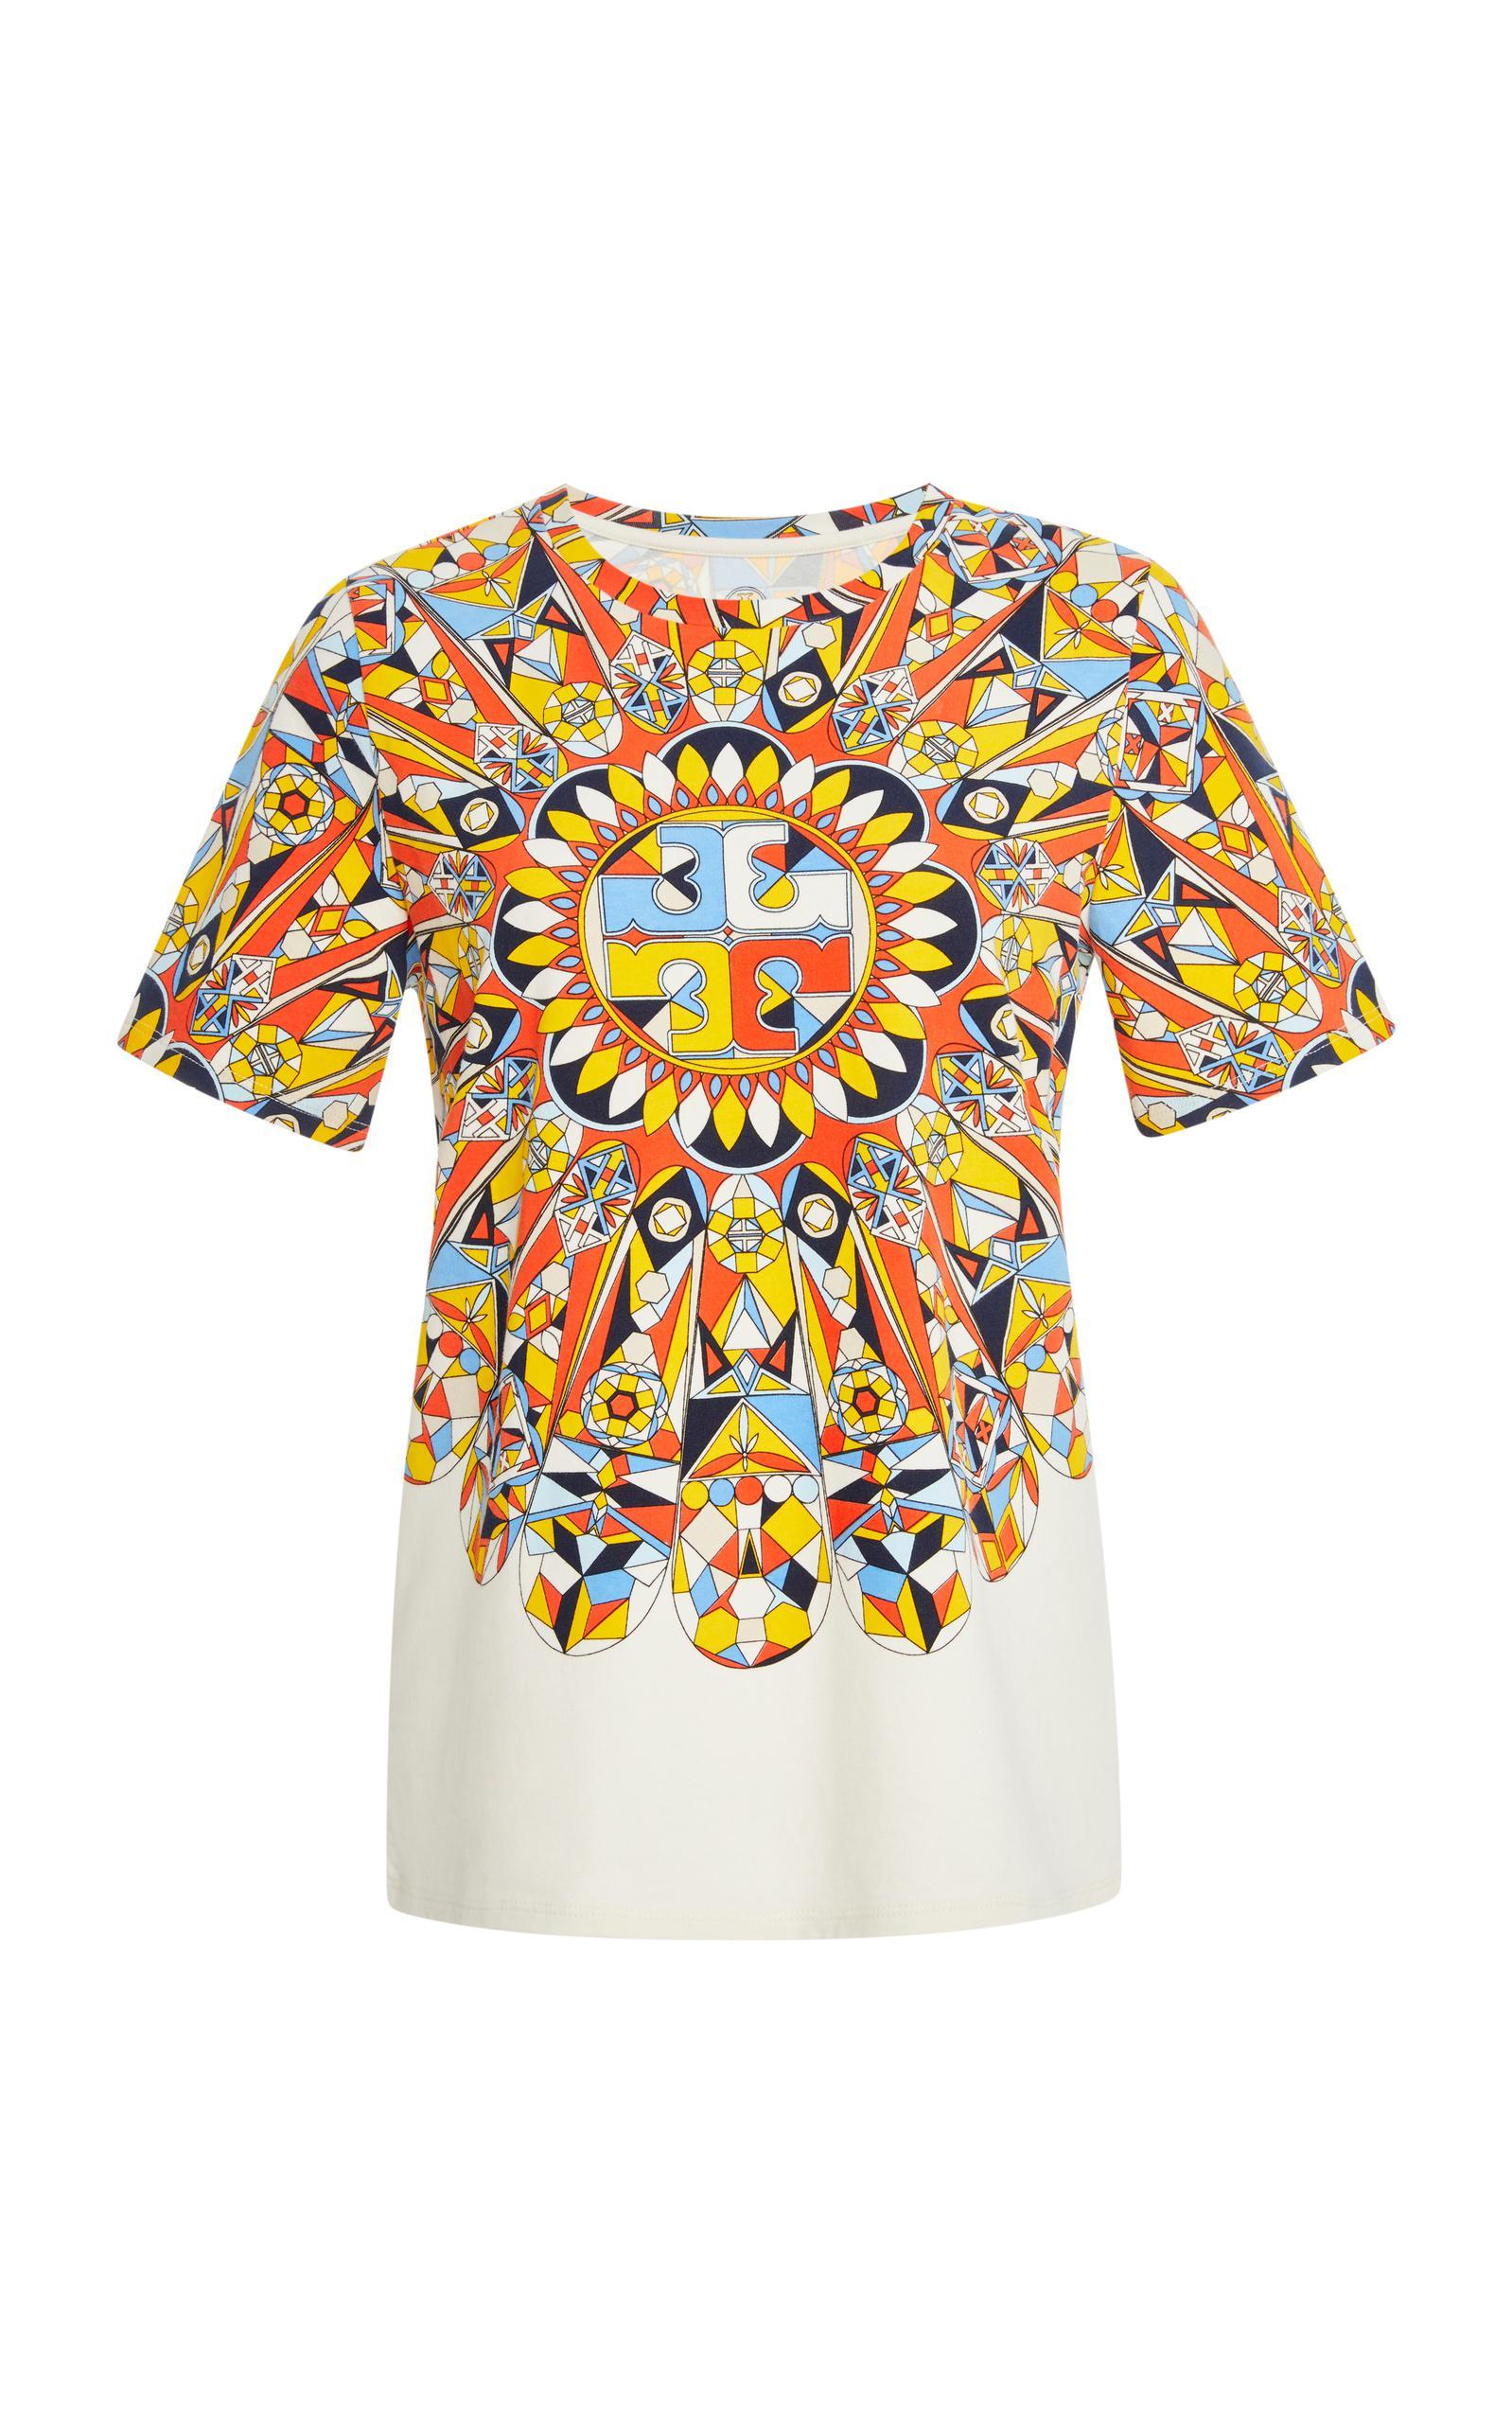 Lyst tory burch keaton t shirt for Tory burch t shirt